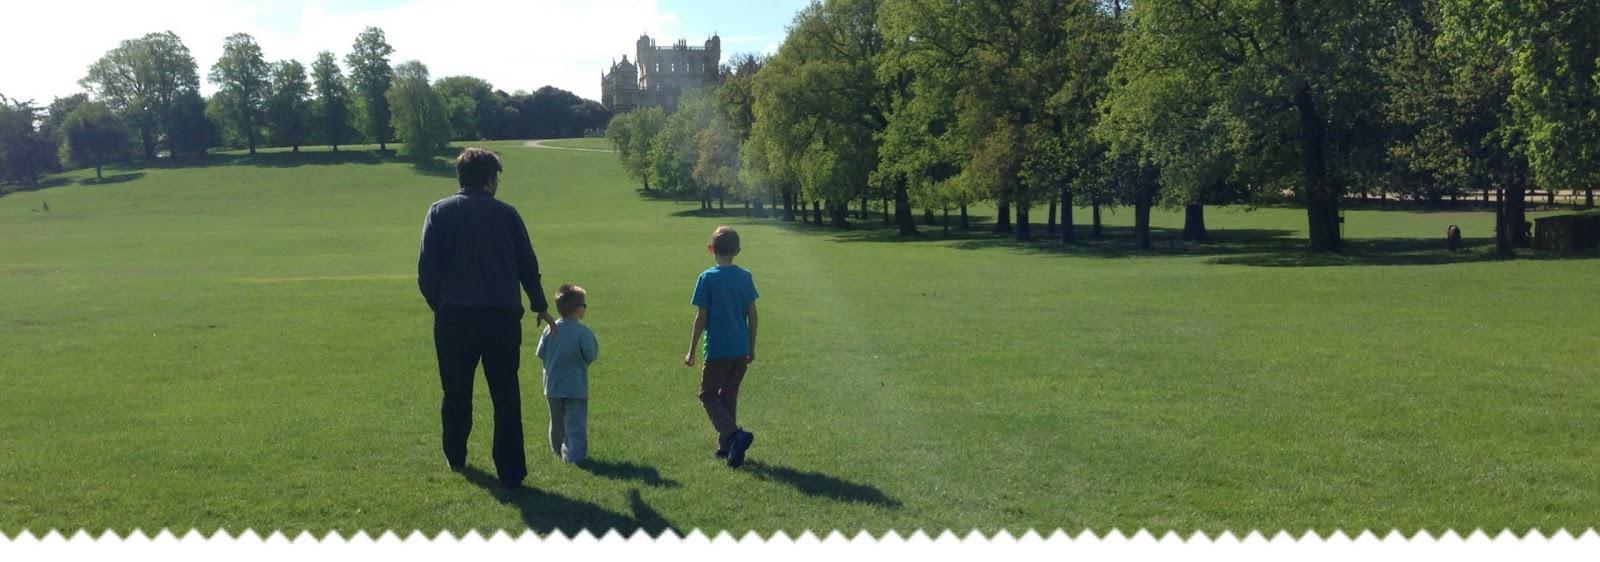 A dad and his boys walking at Wollaton Park